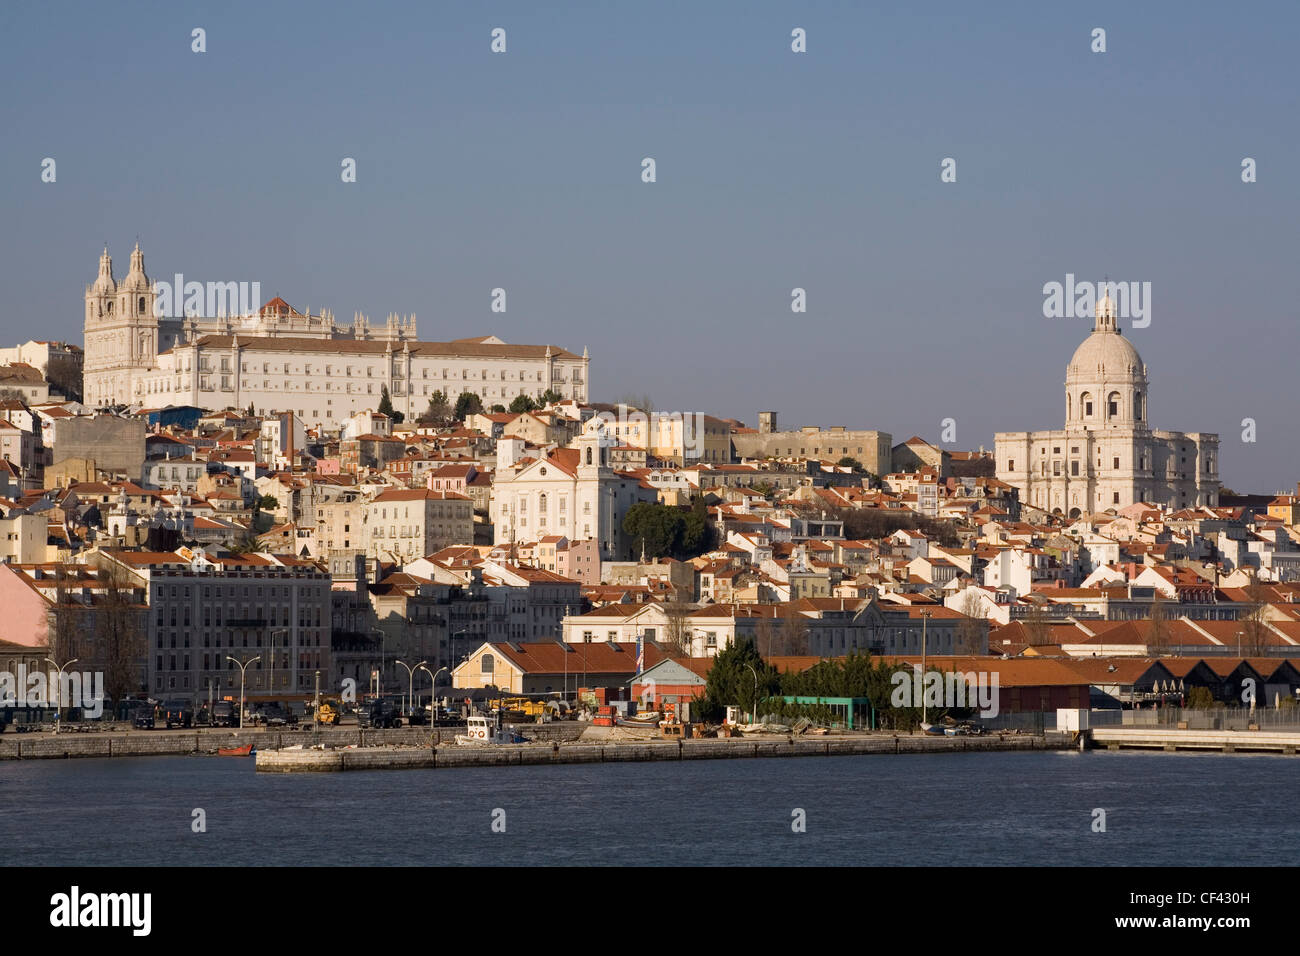 Portugal Lisbon, city skyline, with Sao Vicente monastery, Santa Luzia church & National Pantheon Stock Photo